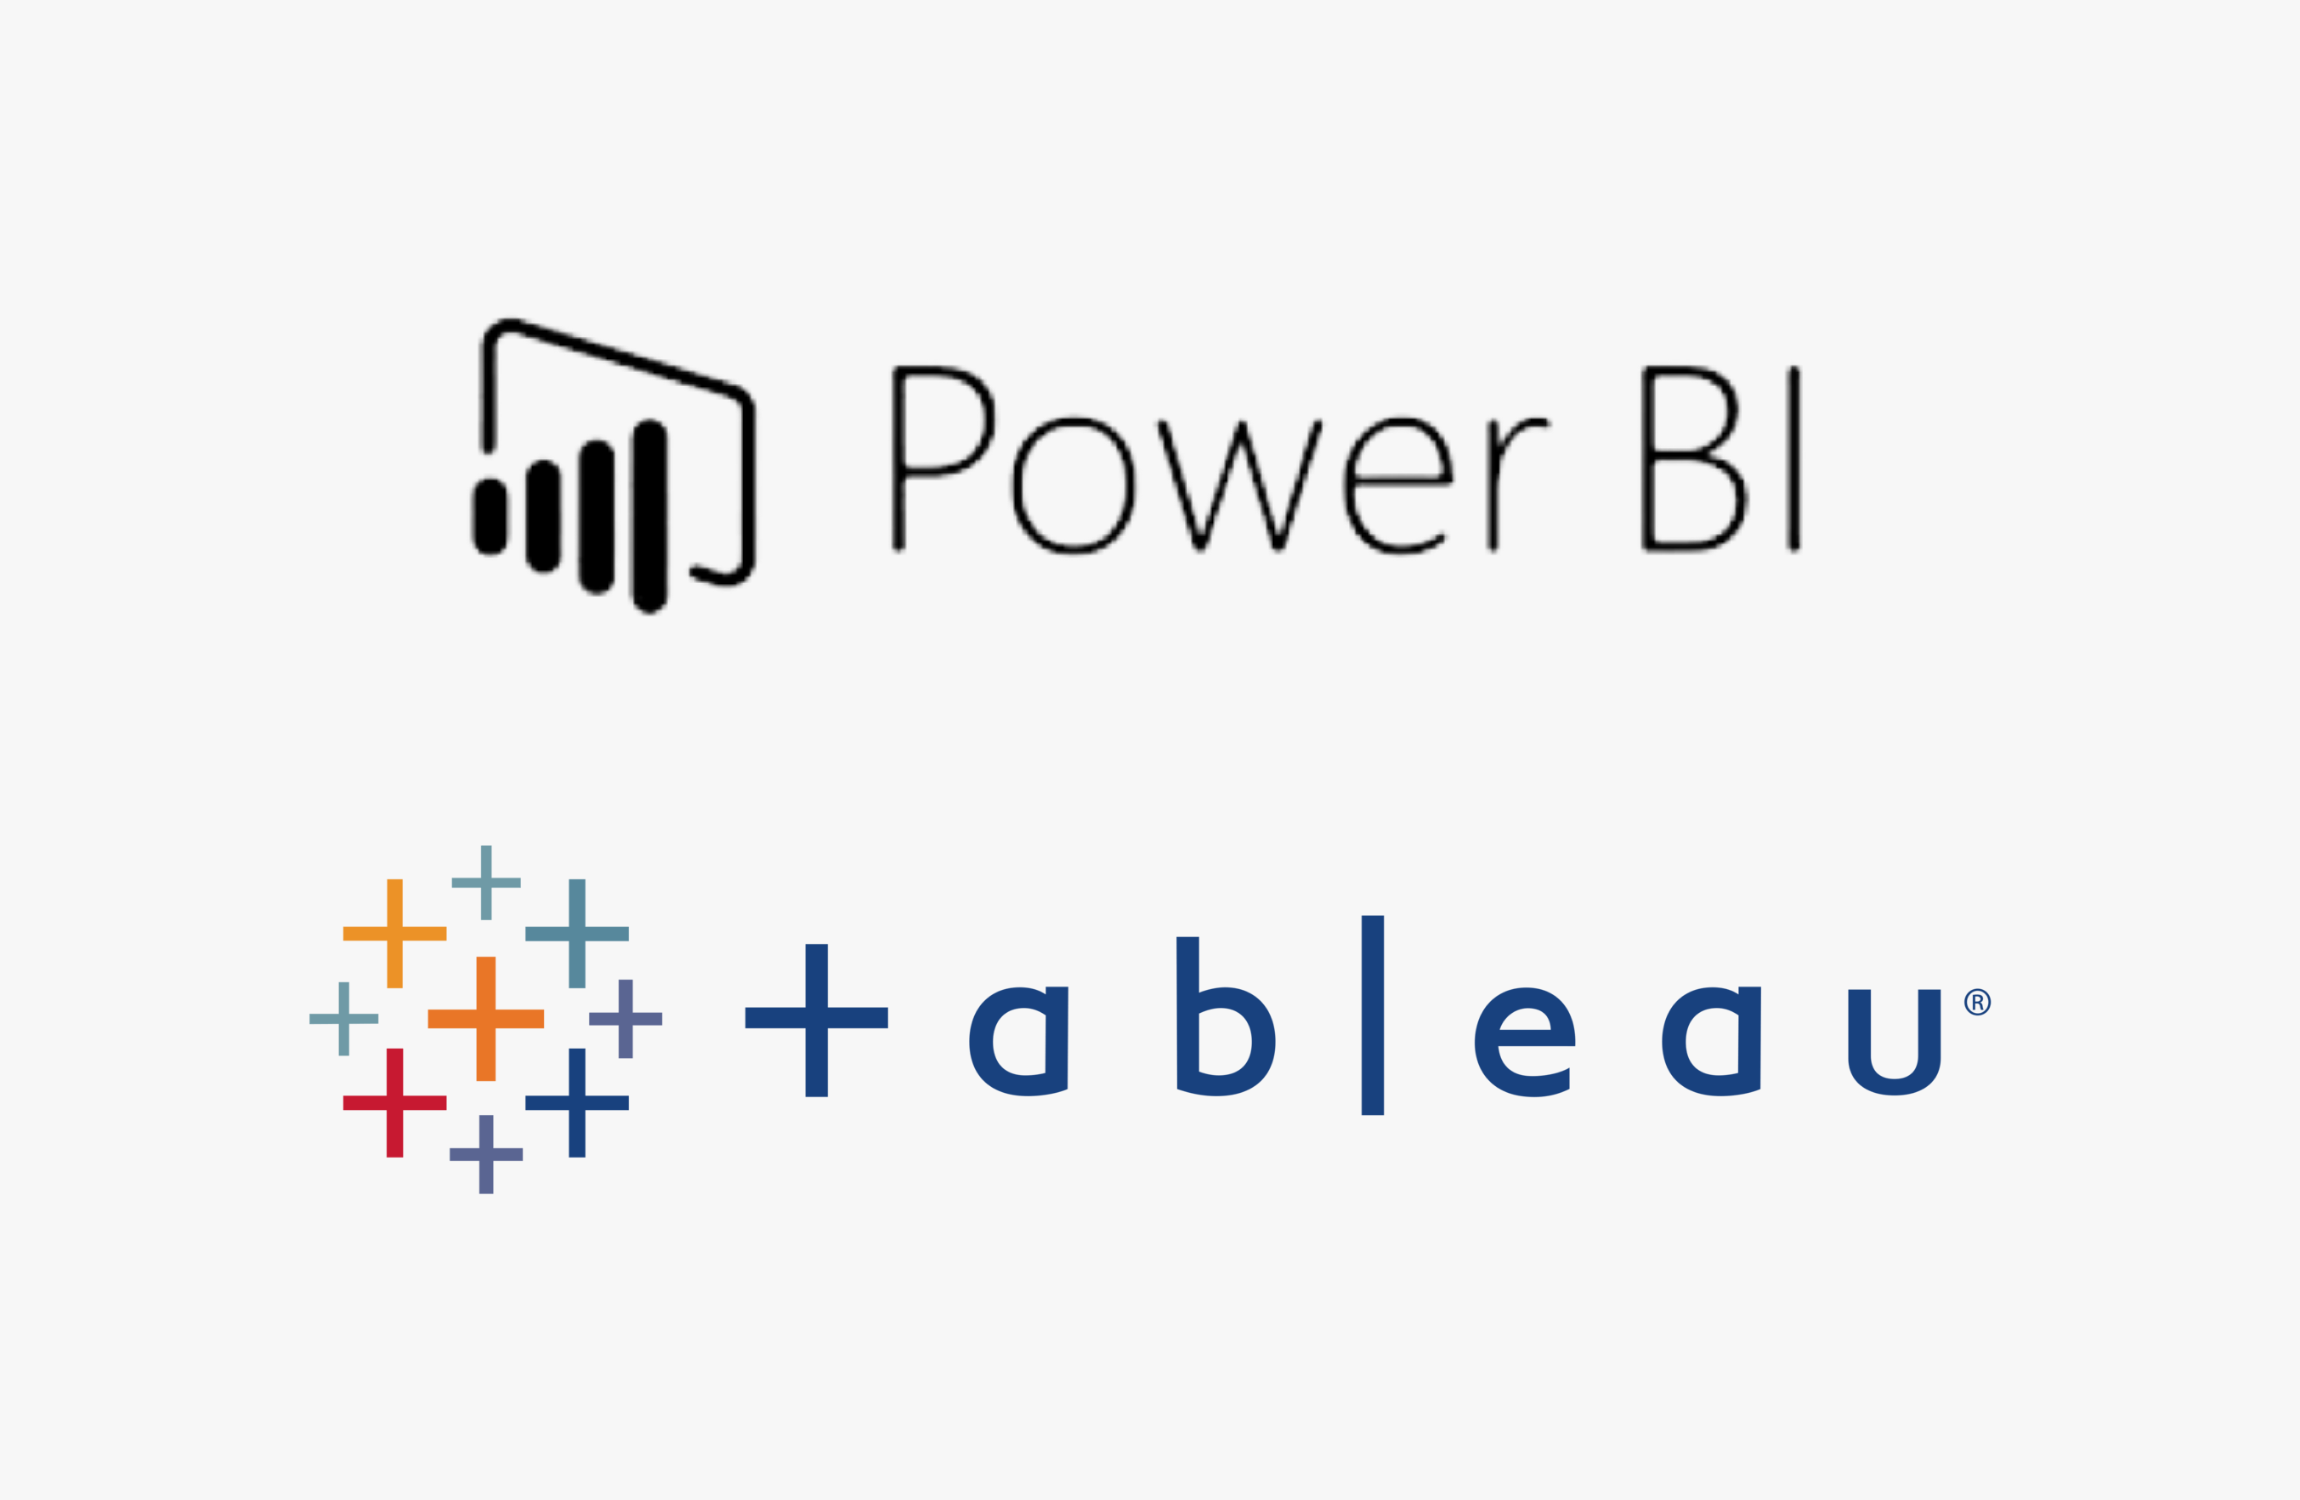 Microsoft Power BI Tableau